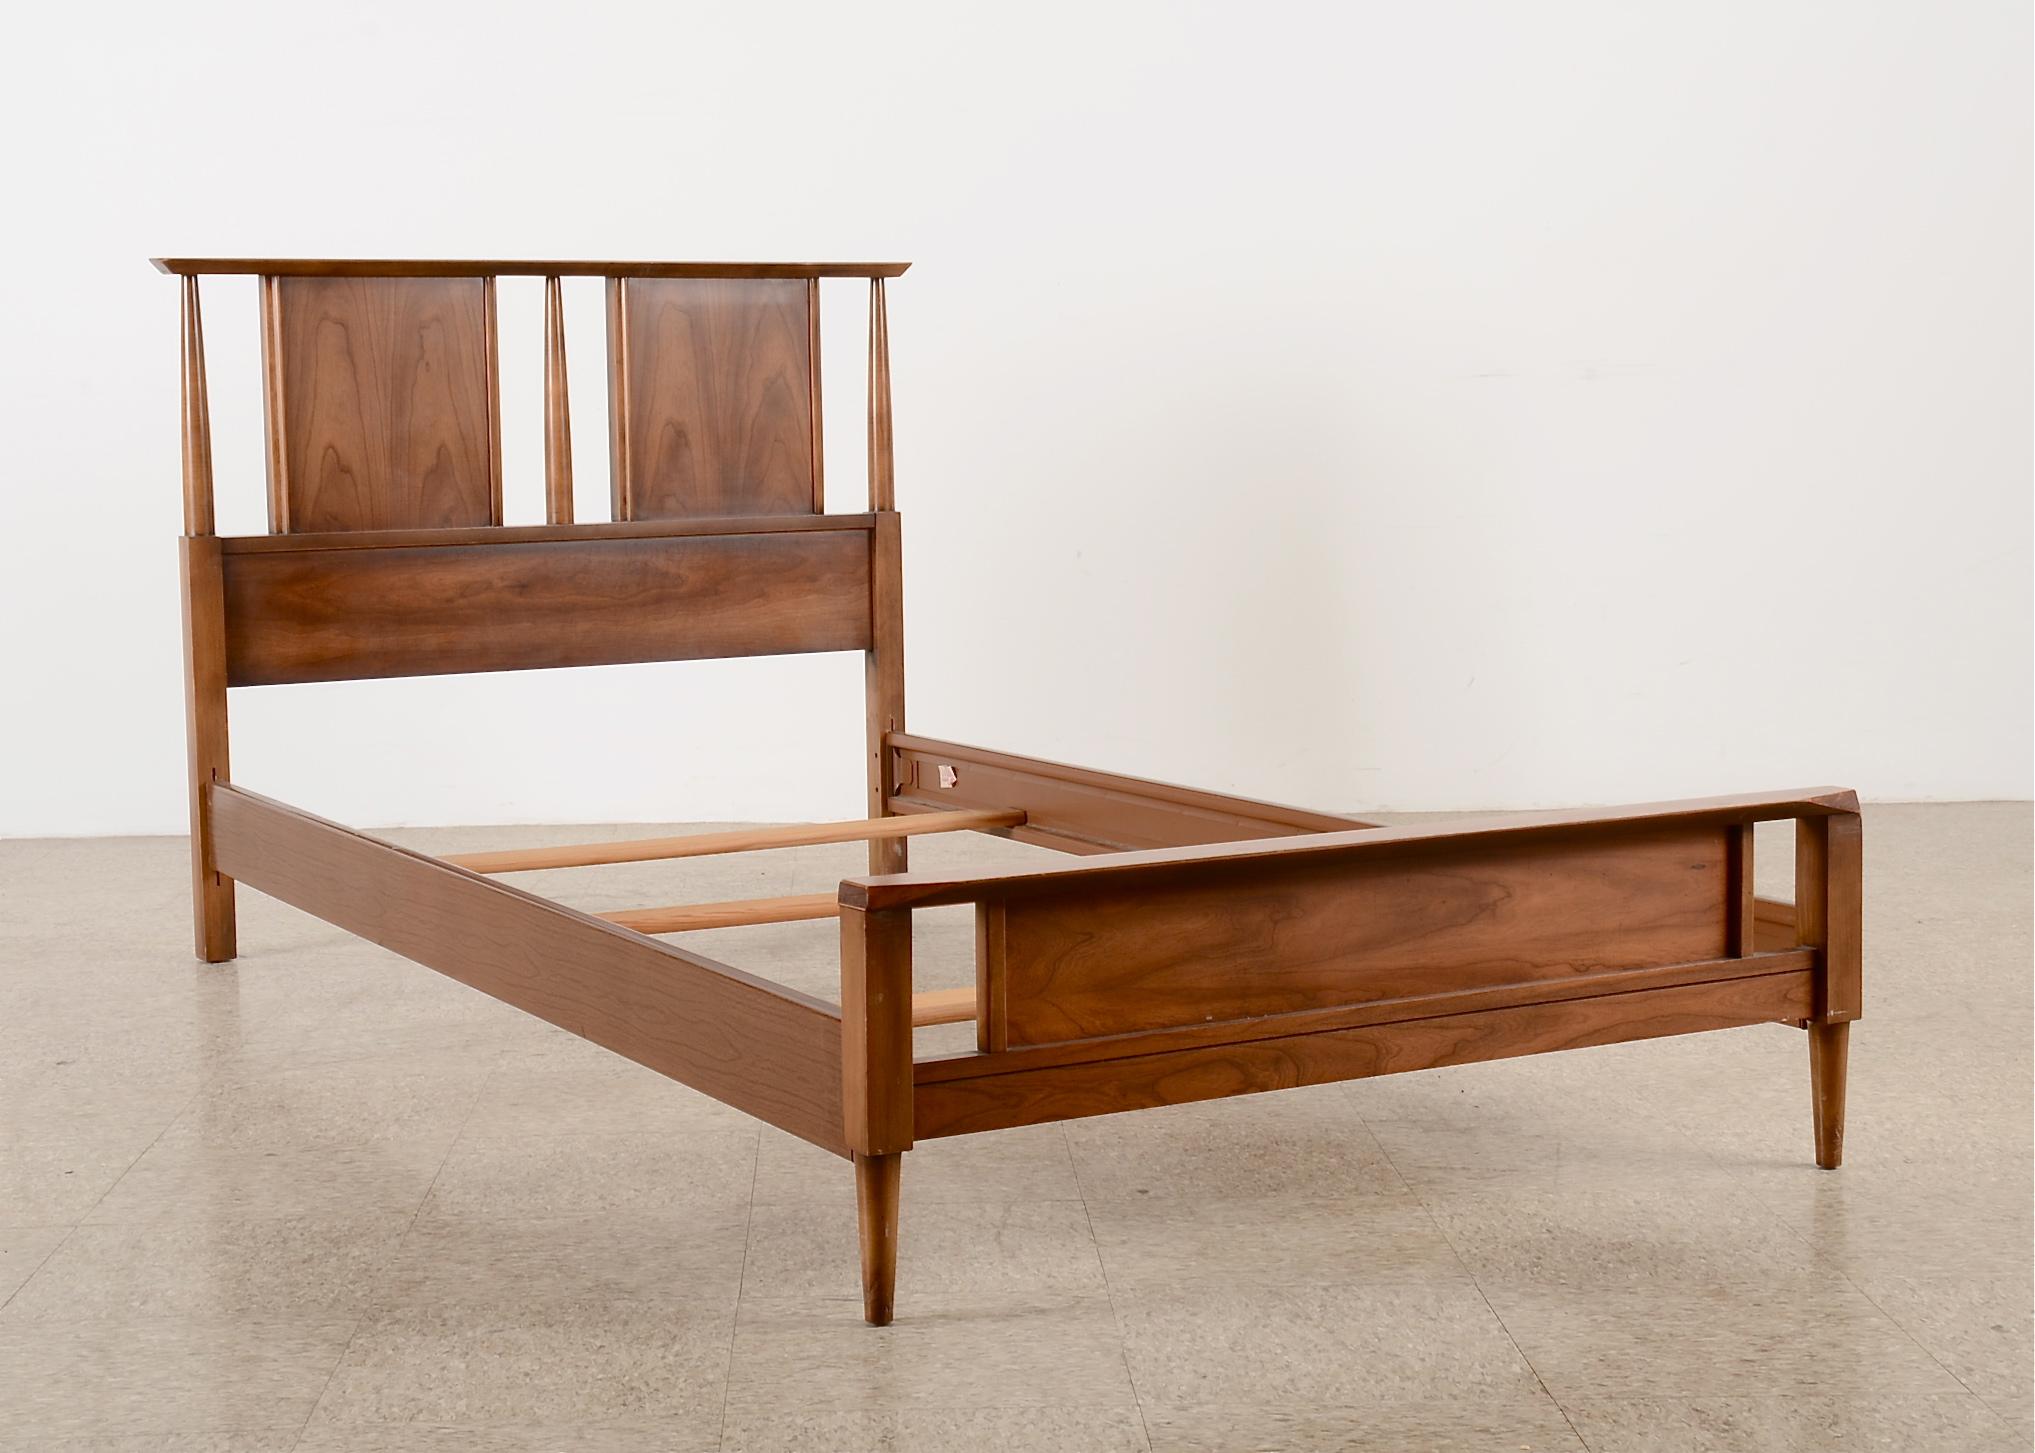 MidCentury Modern Bed Frame Dixie Furniture EBTH